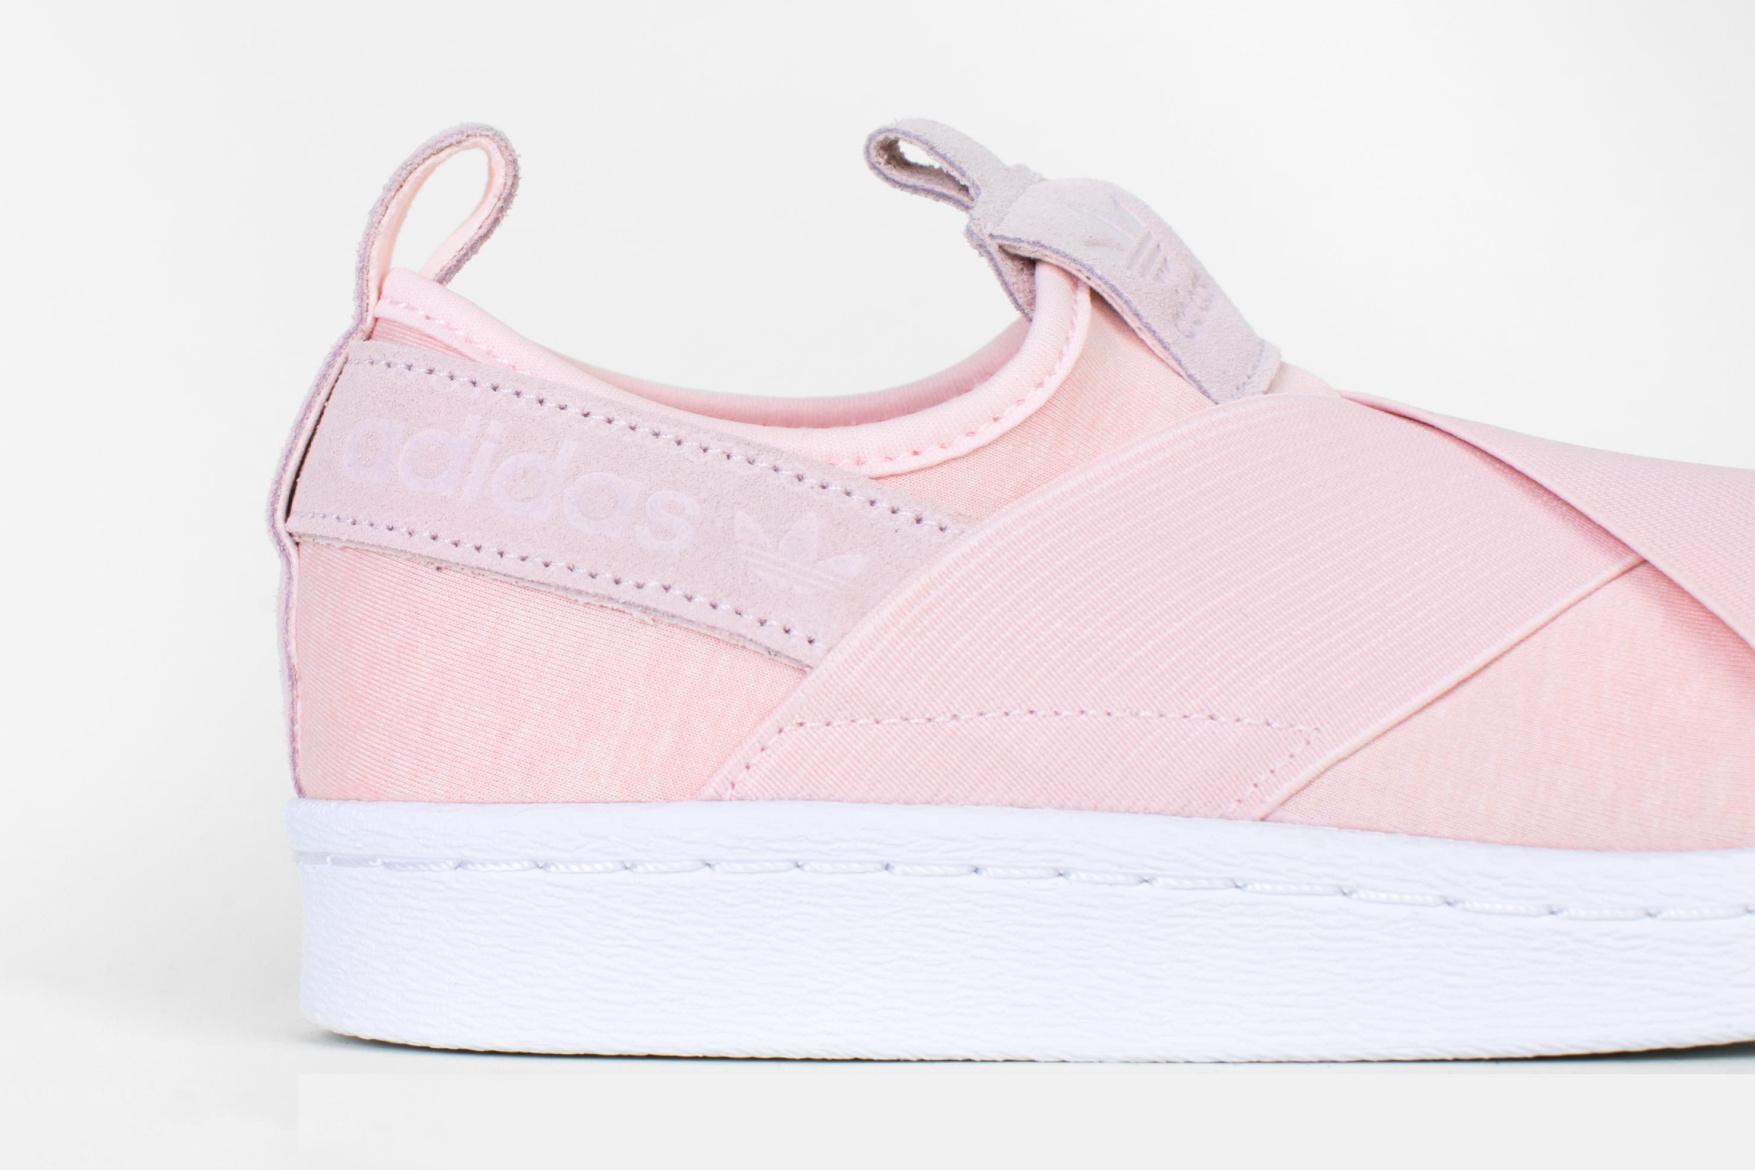 adidas-originals-superstar-slip-on-pink-01.jpg